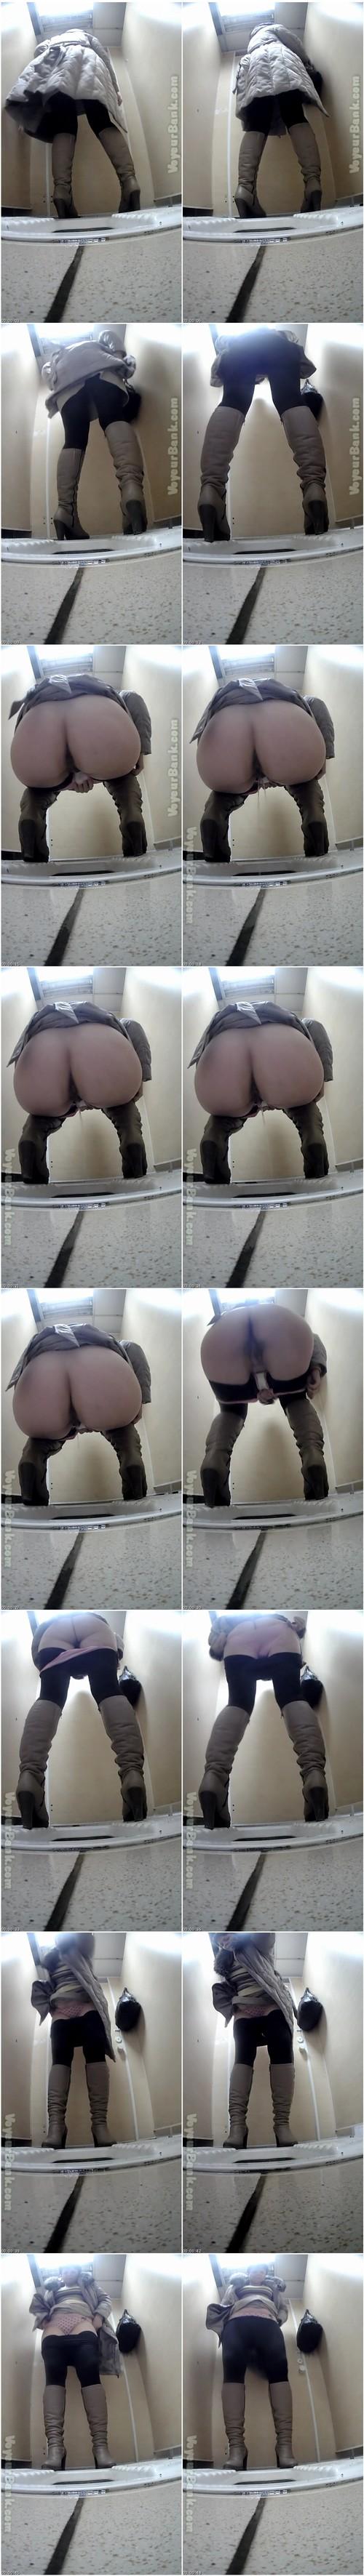 Toilet076_thumb_m.jpg